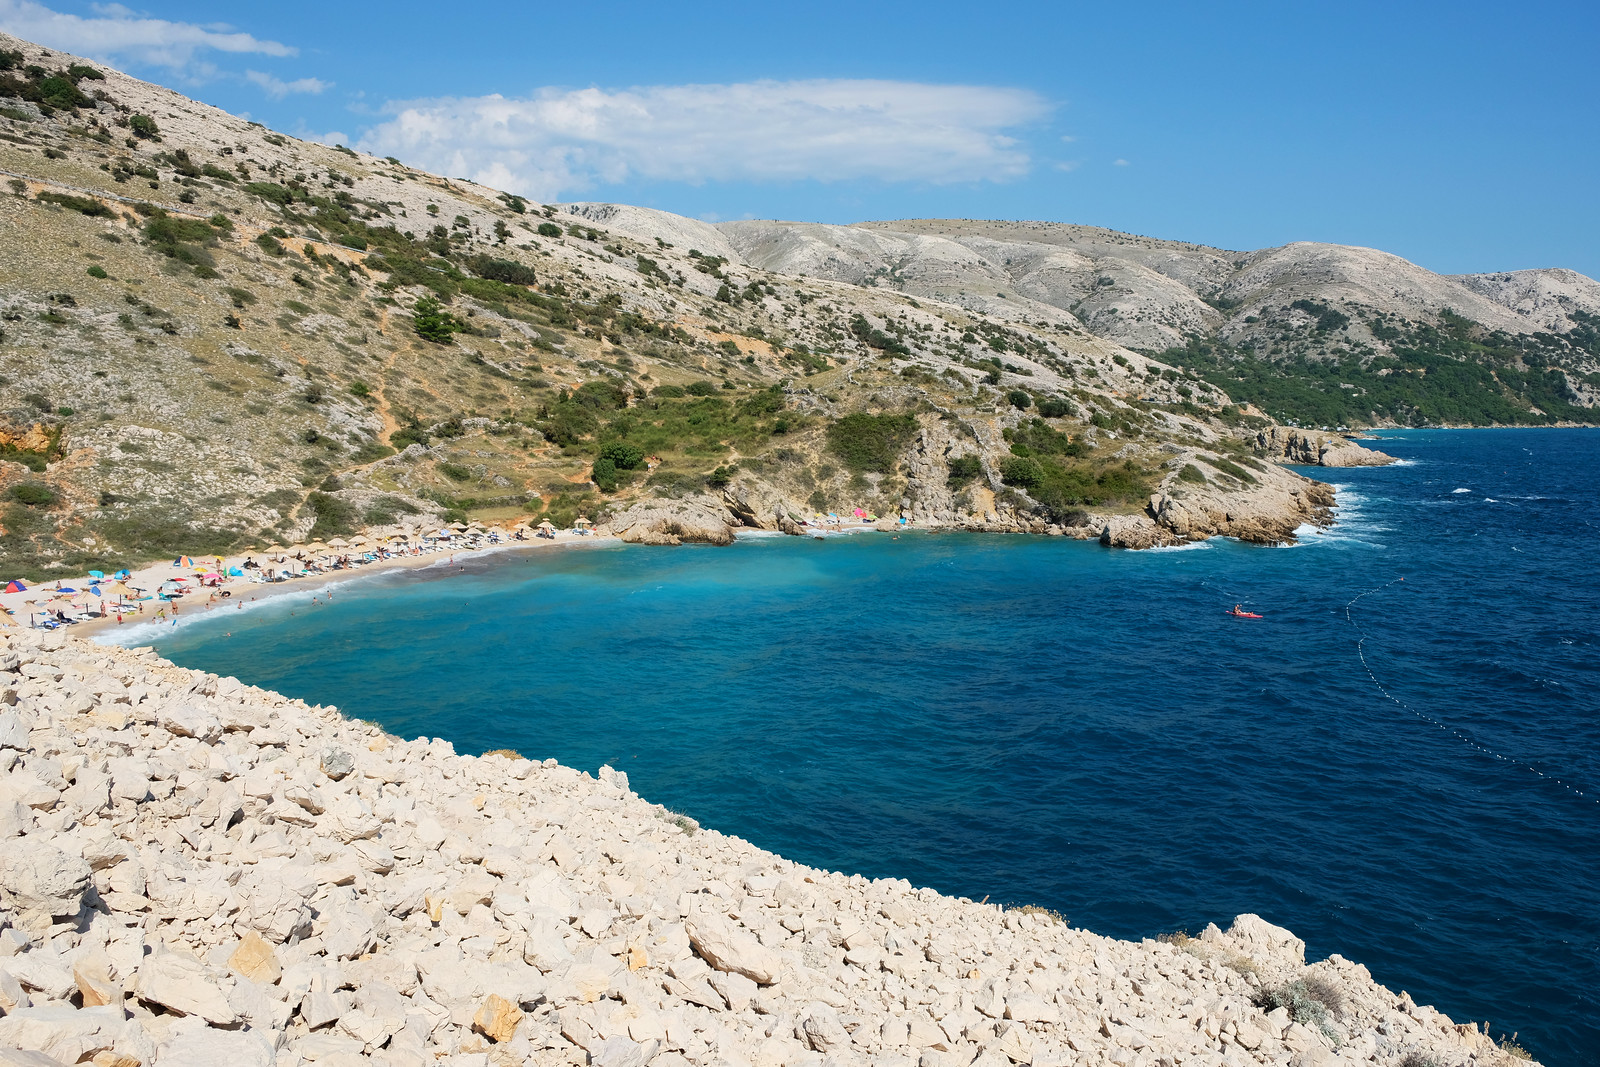 Oprna Bay, Krk Island, Croatia